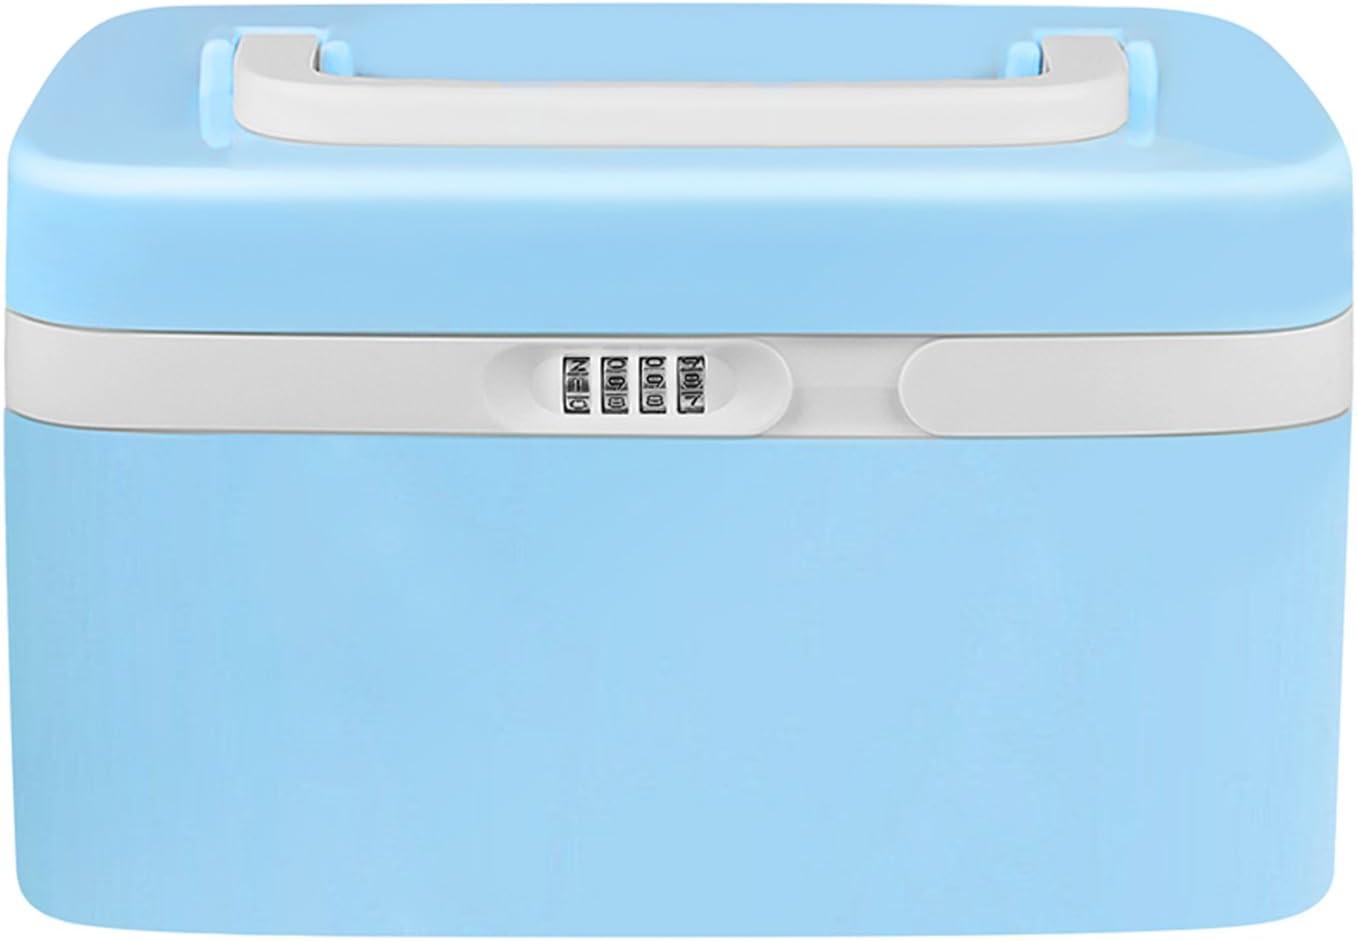 eoere Combination Lock Medicine Cabinet with Separate Compartments,Locking Prescription Pill Case,Child Proof Plastic Storage Box, Size 11 x 7.4 x 6.2 inches, Blue